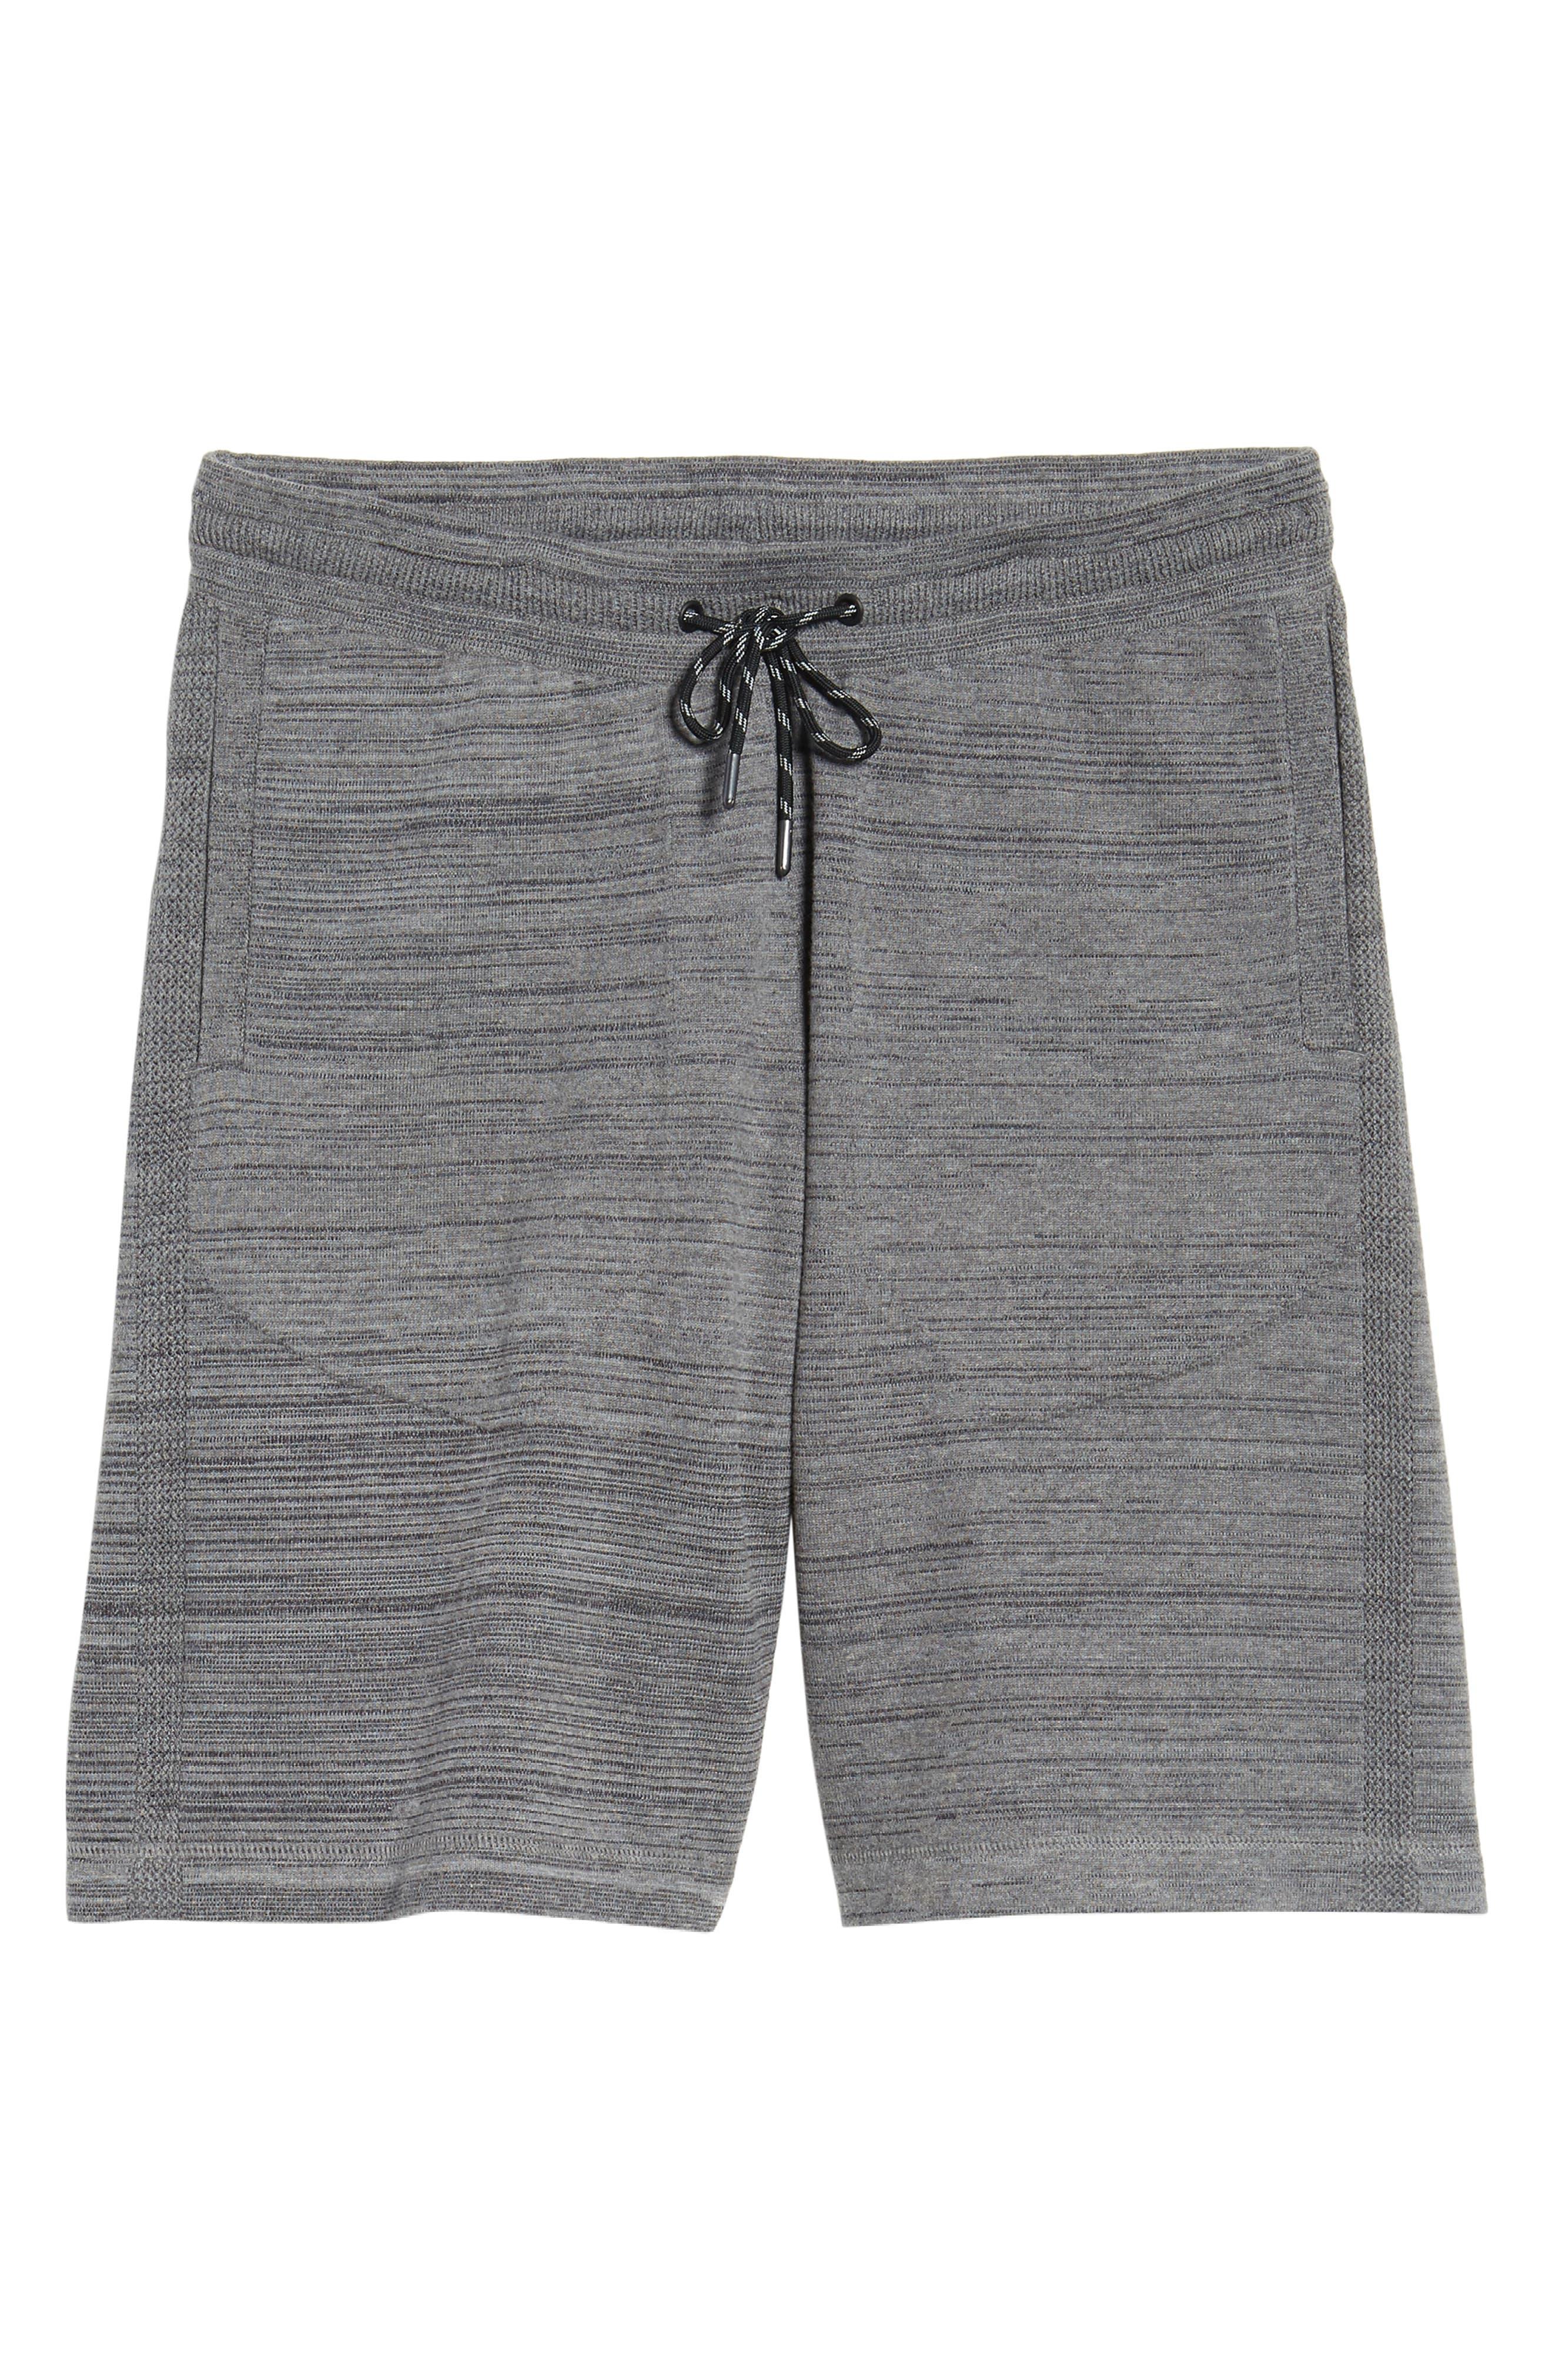 Tech Shorts,                             Alternate thumbnail 6, color,                             030